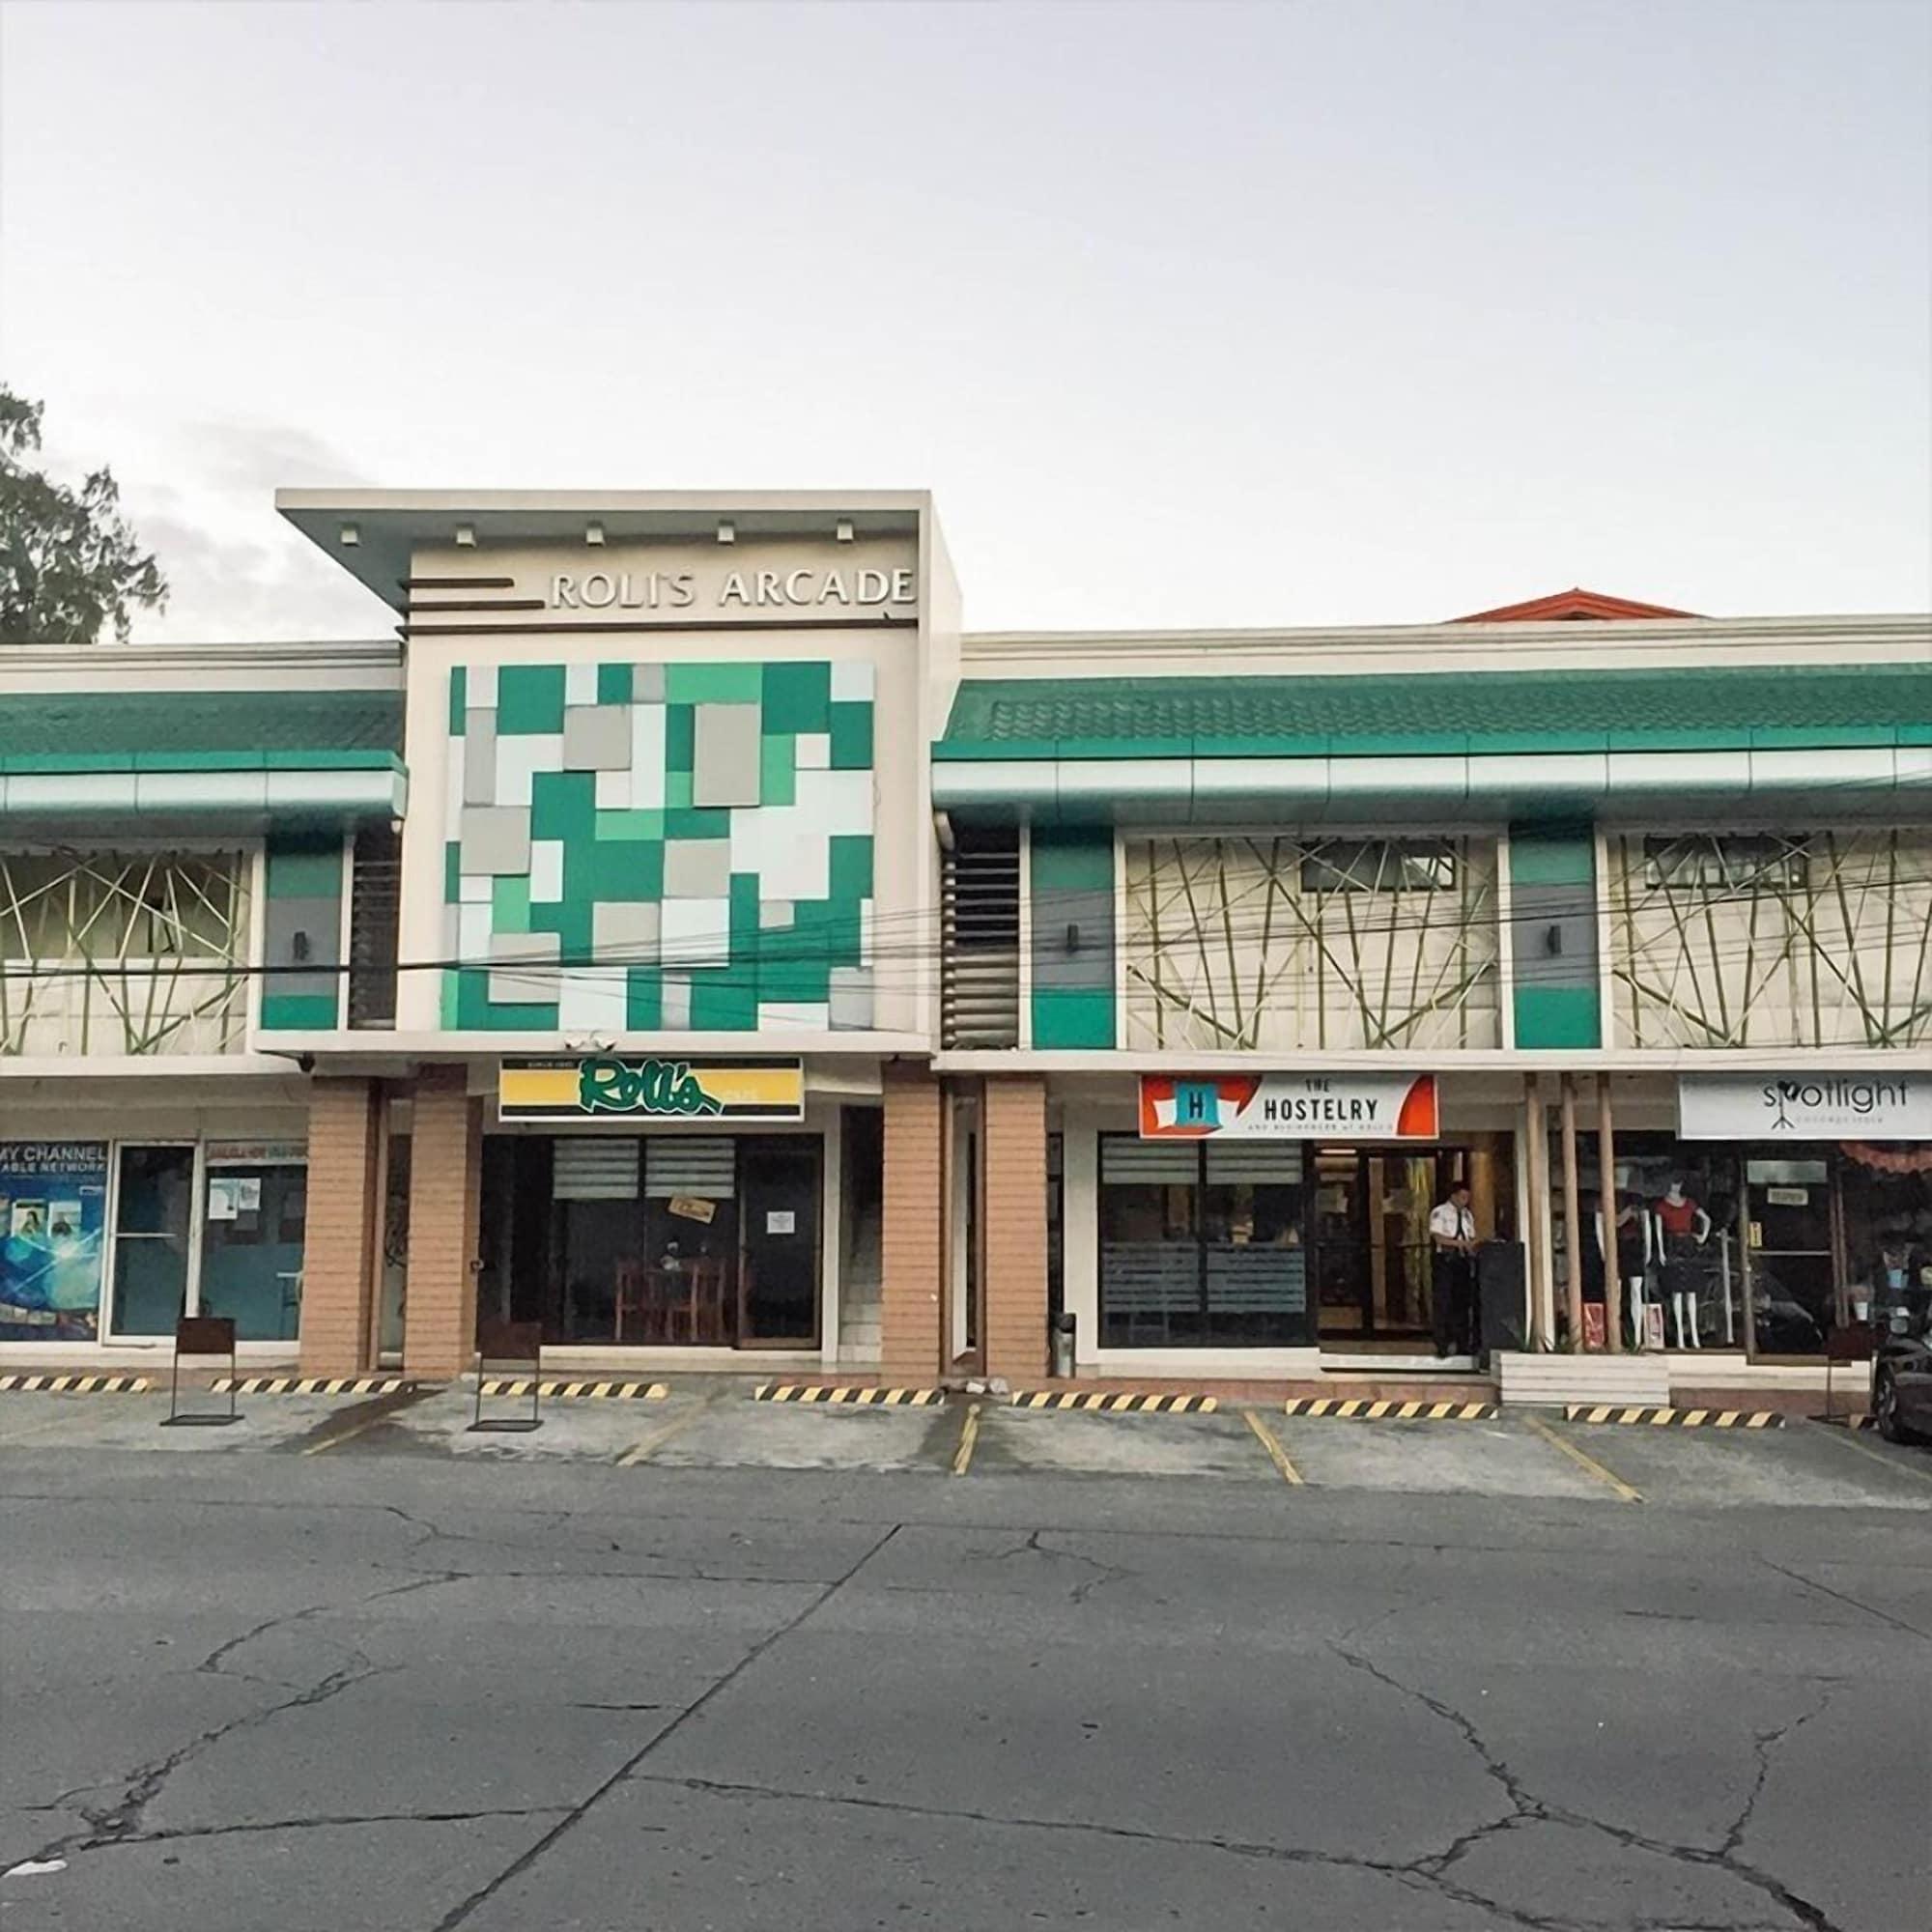 The Hostelry, Bacolod City